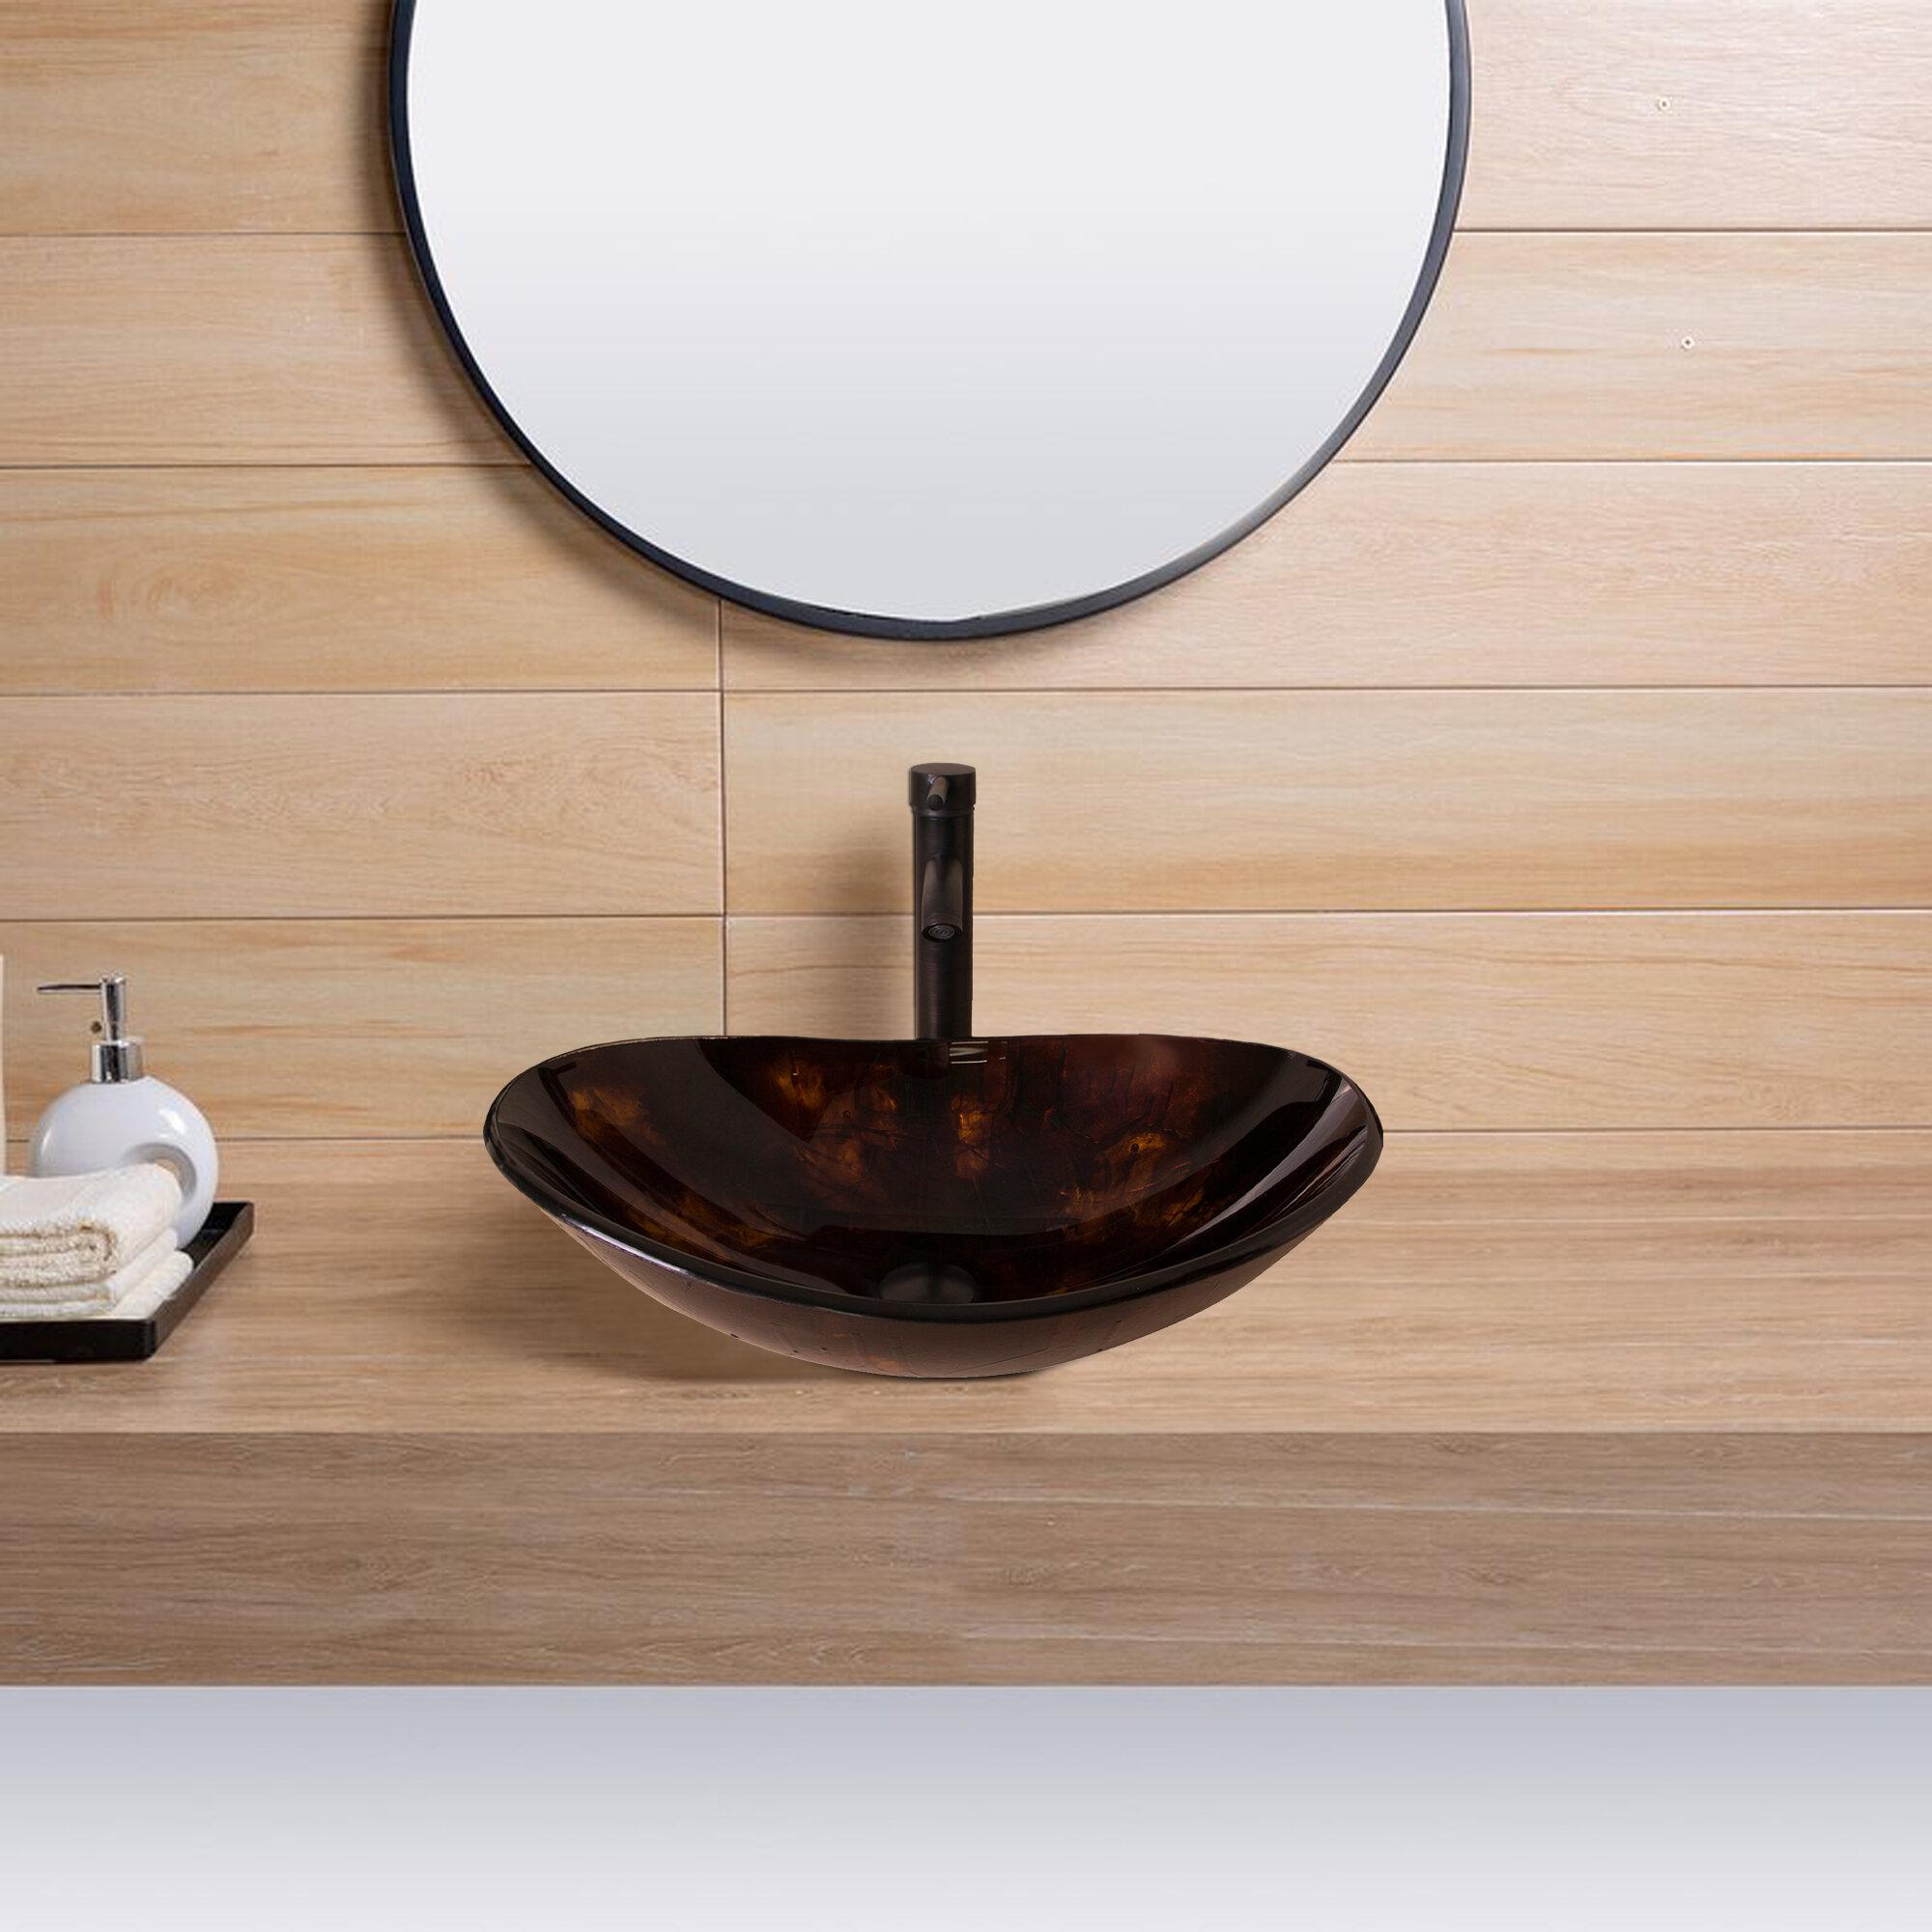 Console Glass Bathroom Sinks You Ll Love In 2021 Wayfair